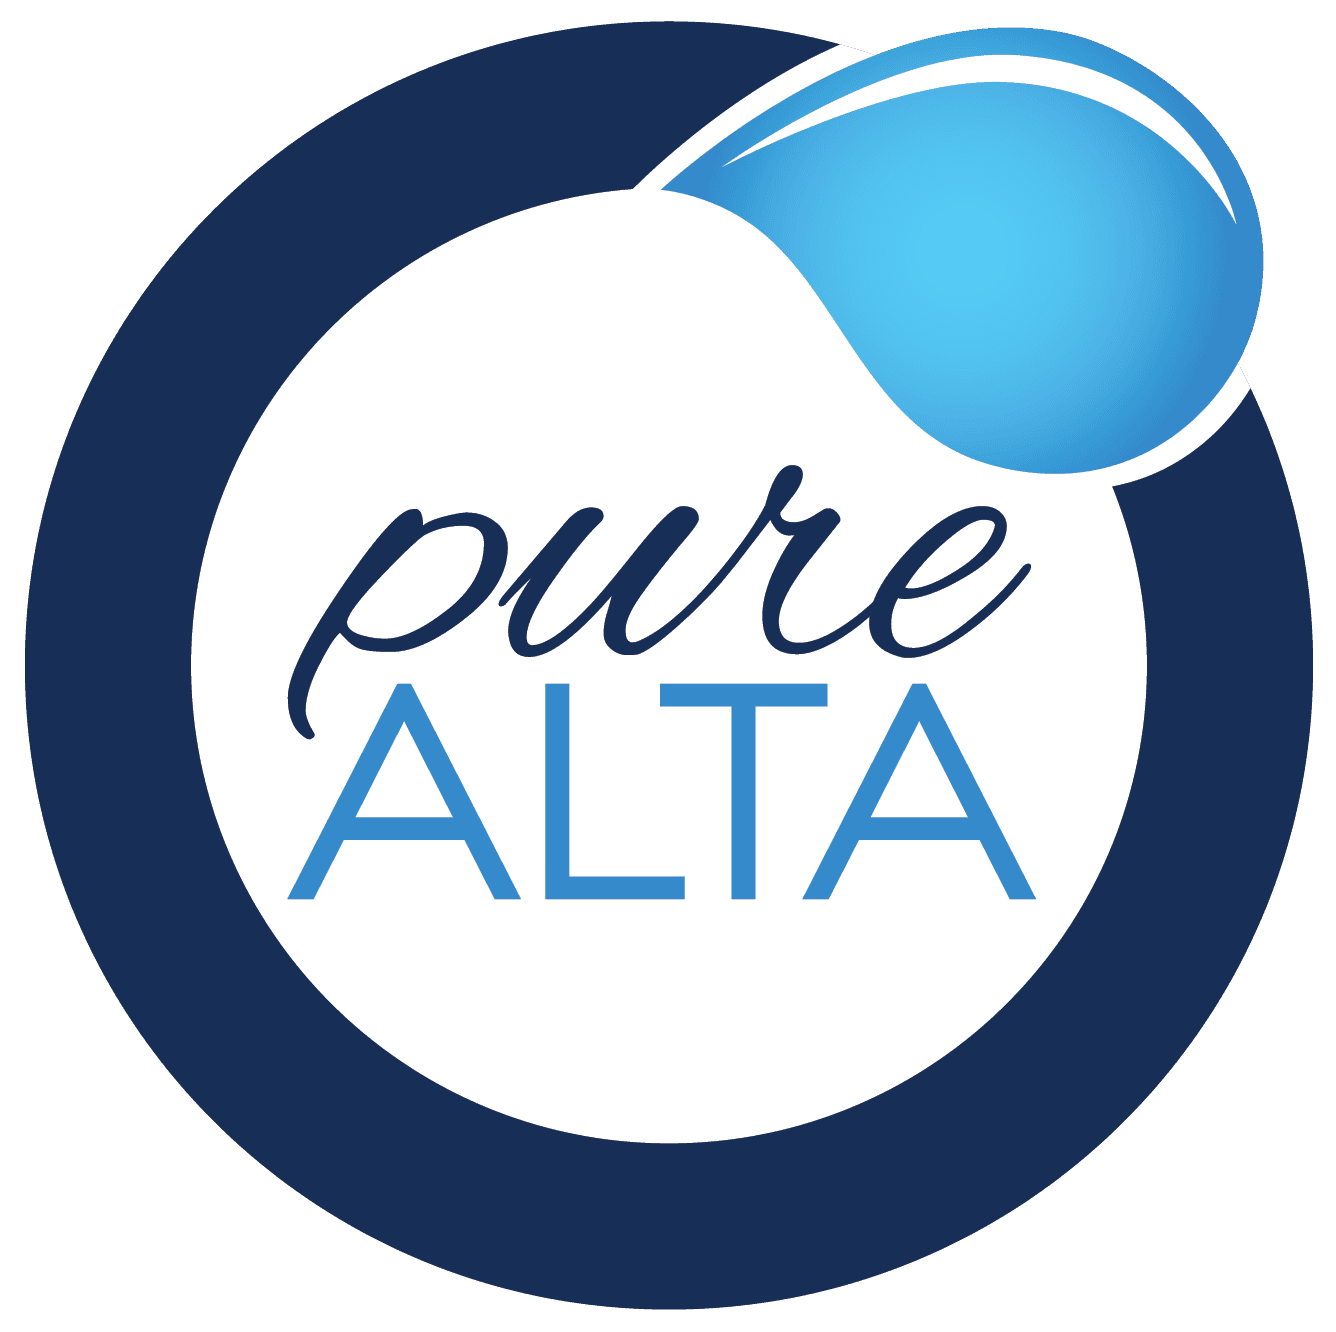 Purealta altamonte springs fl. Flood clipart city drawing